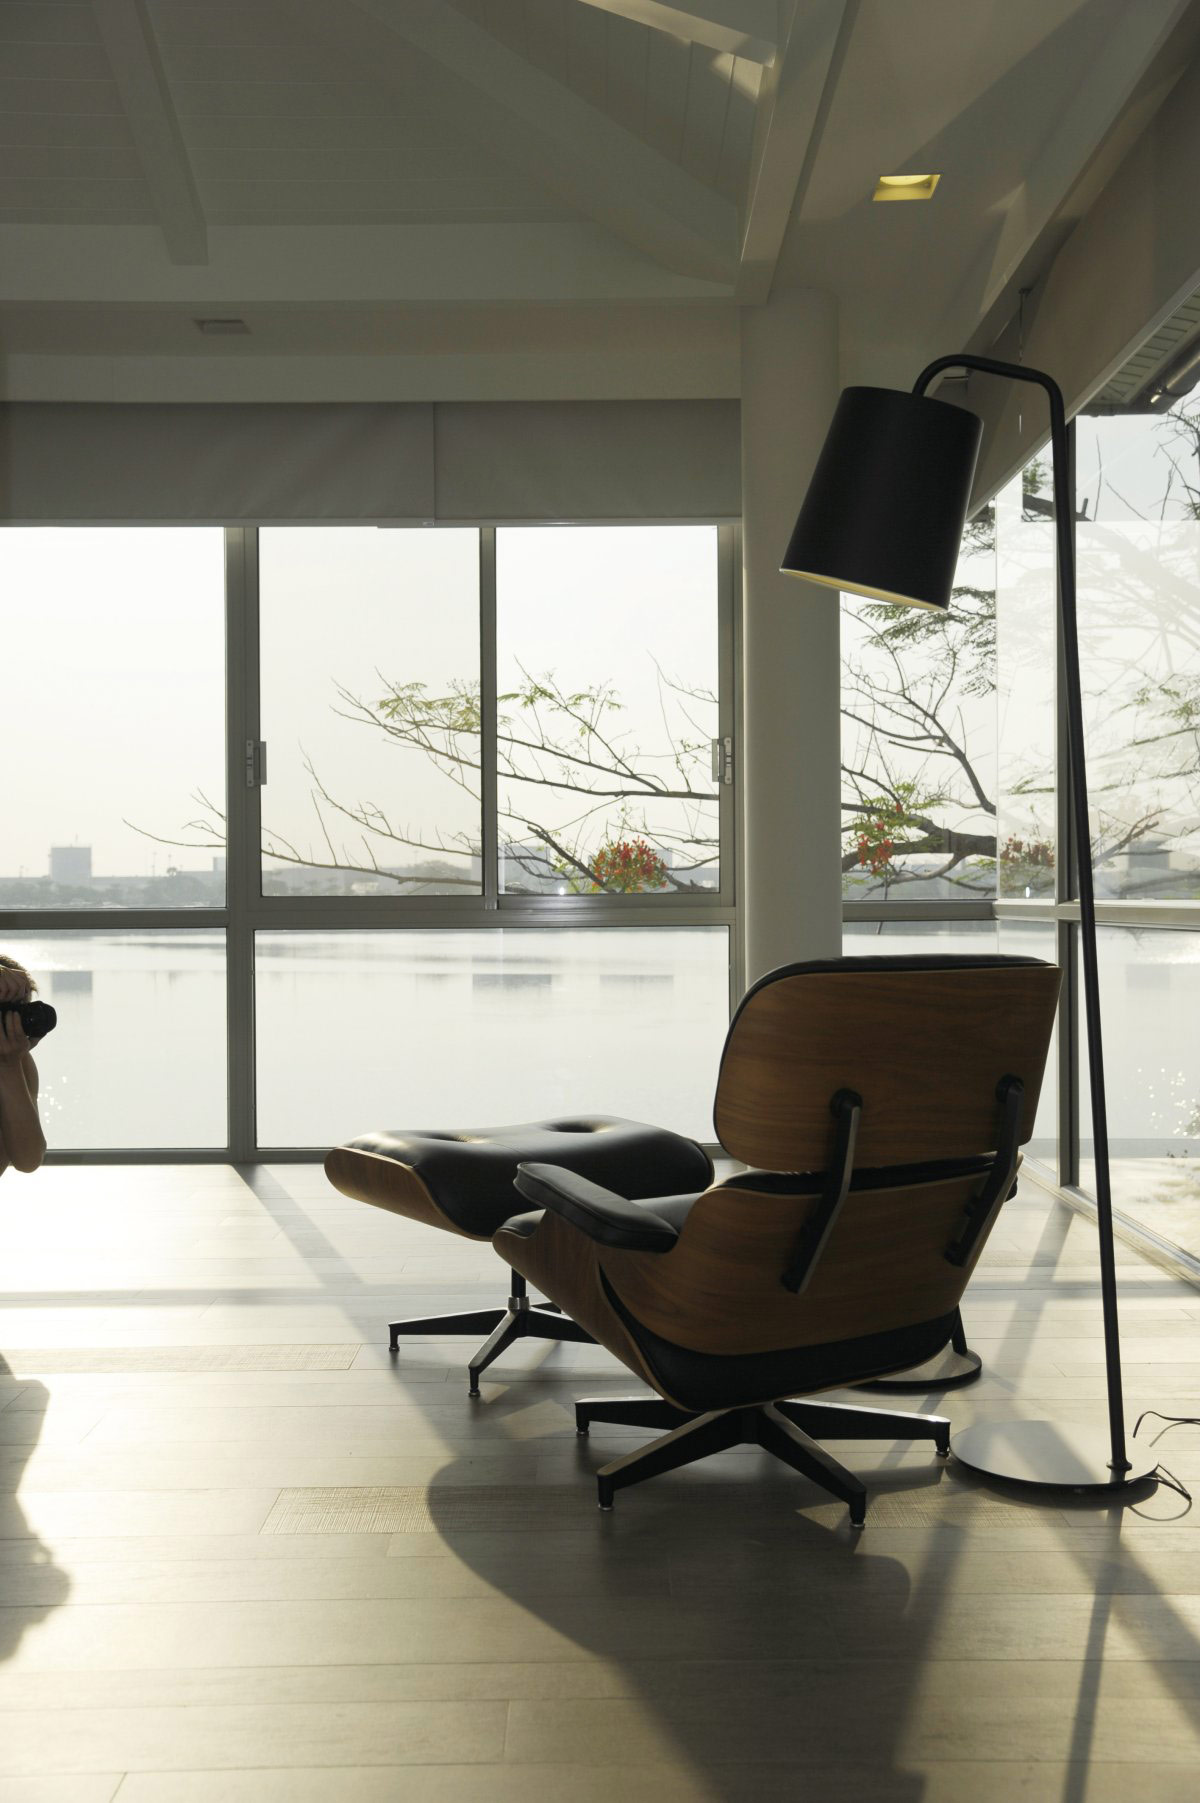 Bedroom, Chair, Lake Views, Baan Citta in Bangkok, Thailand by THE XSS